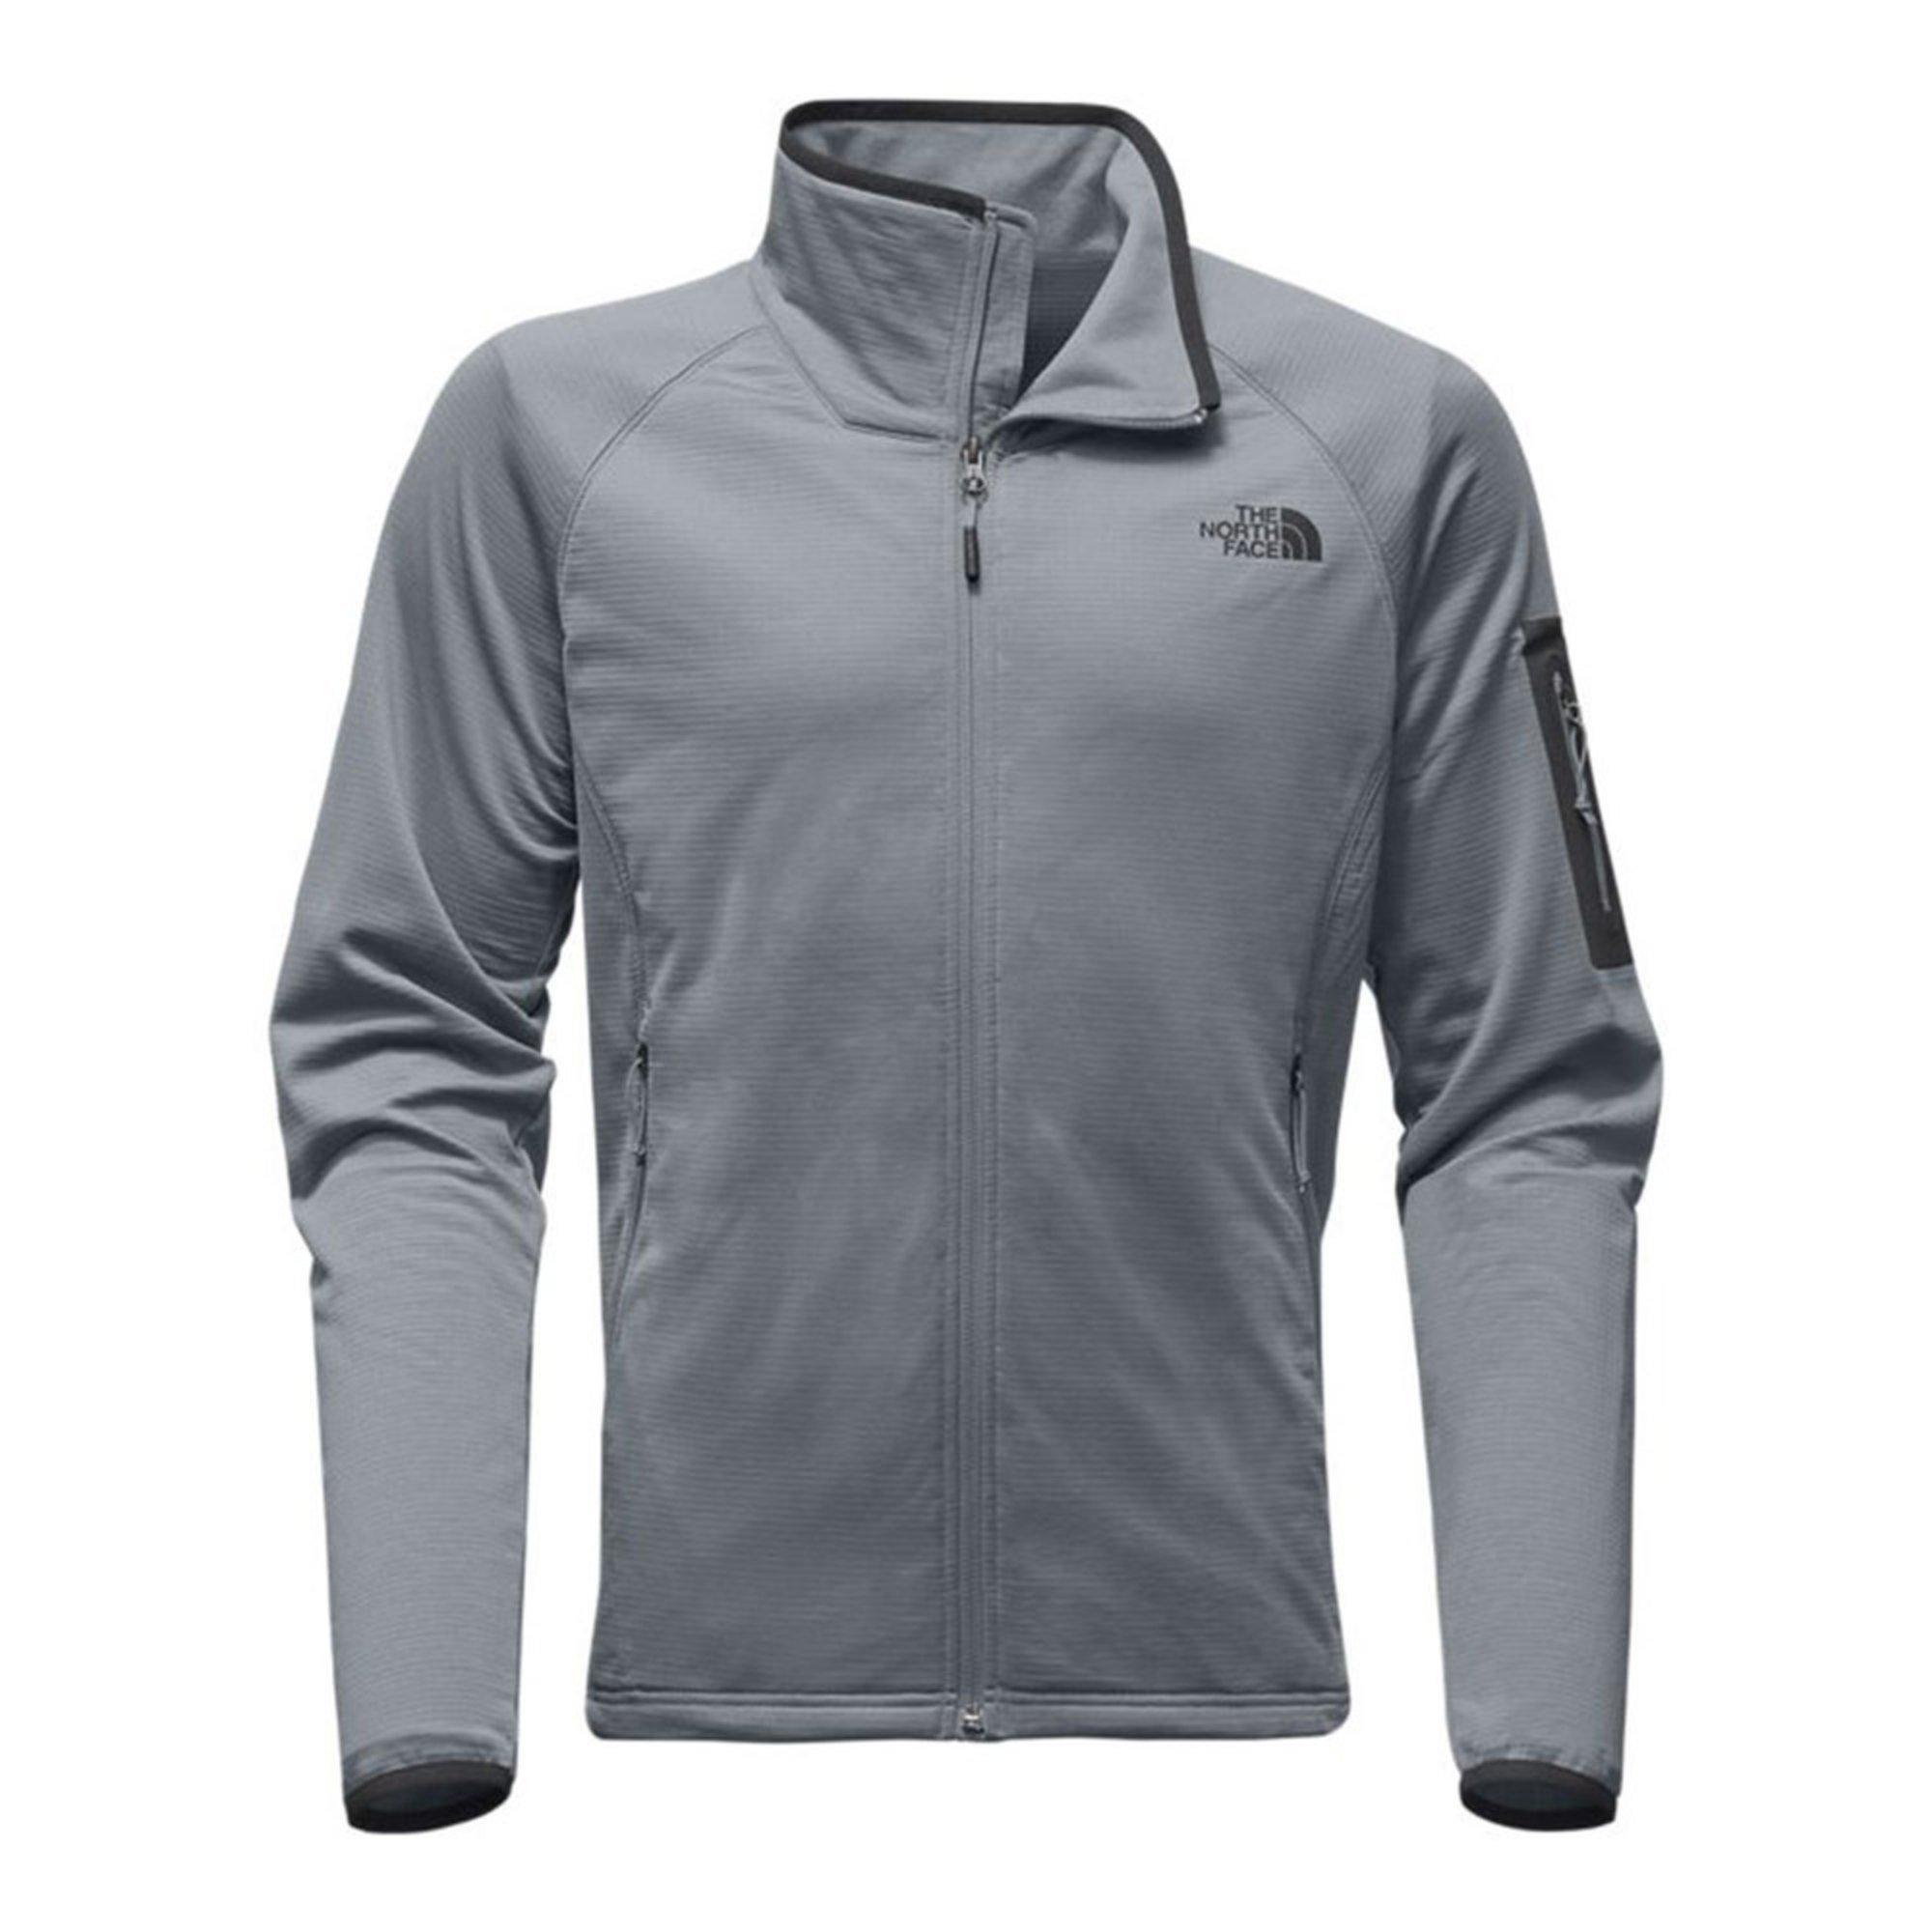 51adbedd6 The North Face Men's Borod Grided Fleece Full Zip Jacket